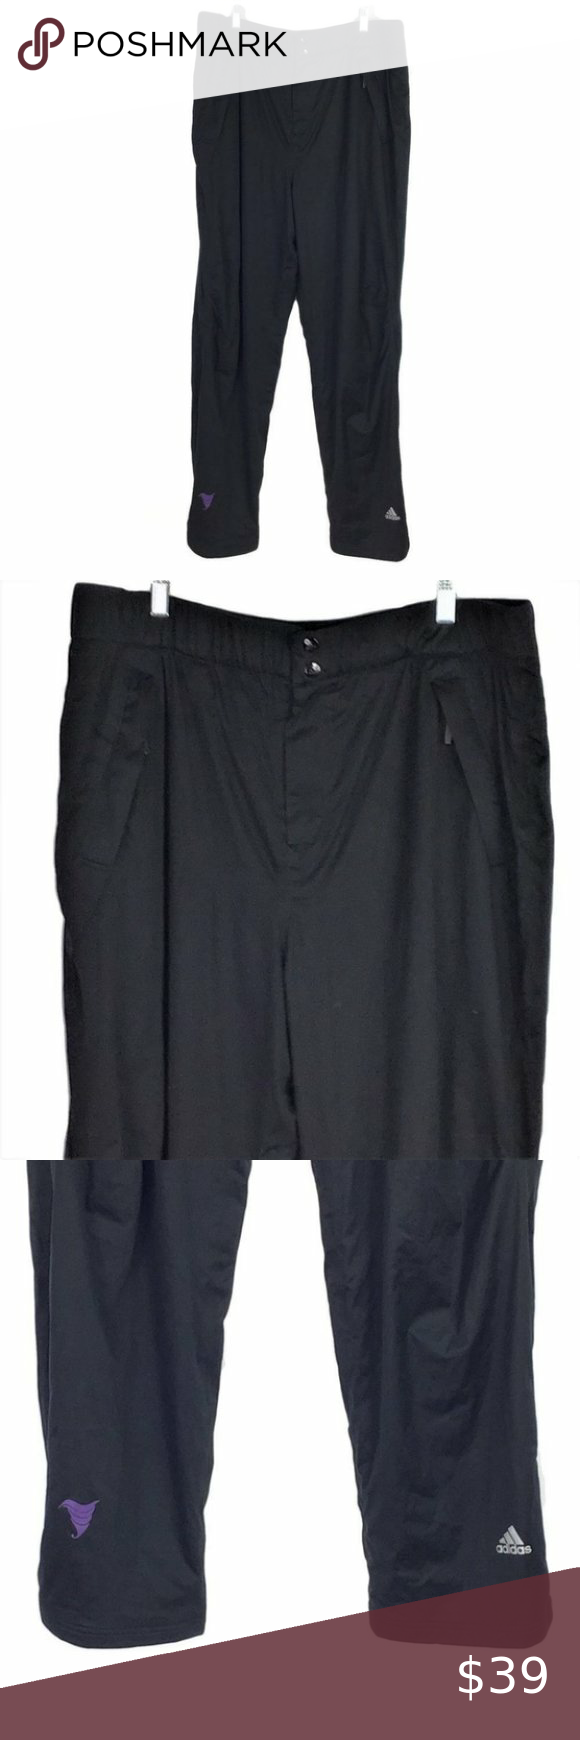 23+ Adidas climaproof waterproof golf pants information